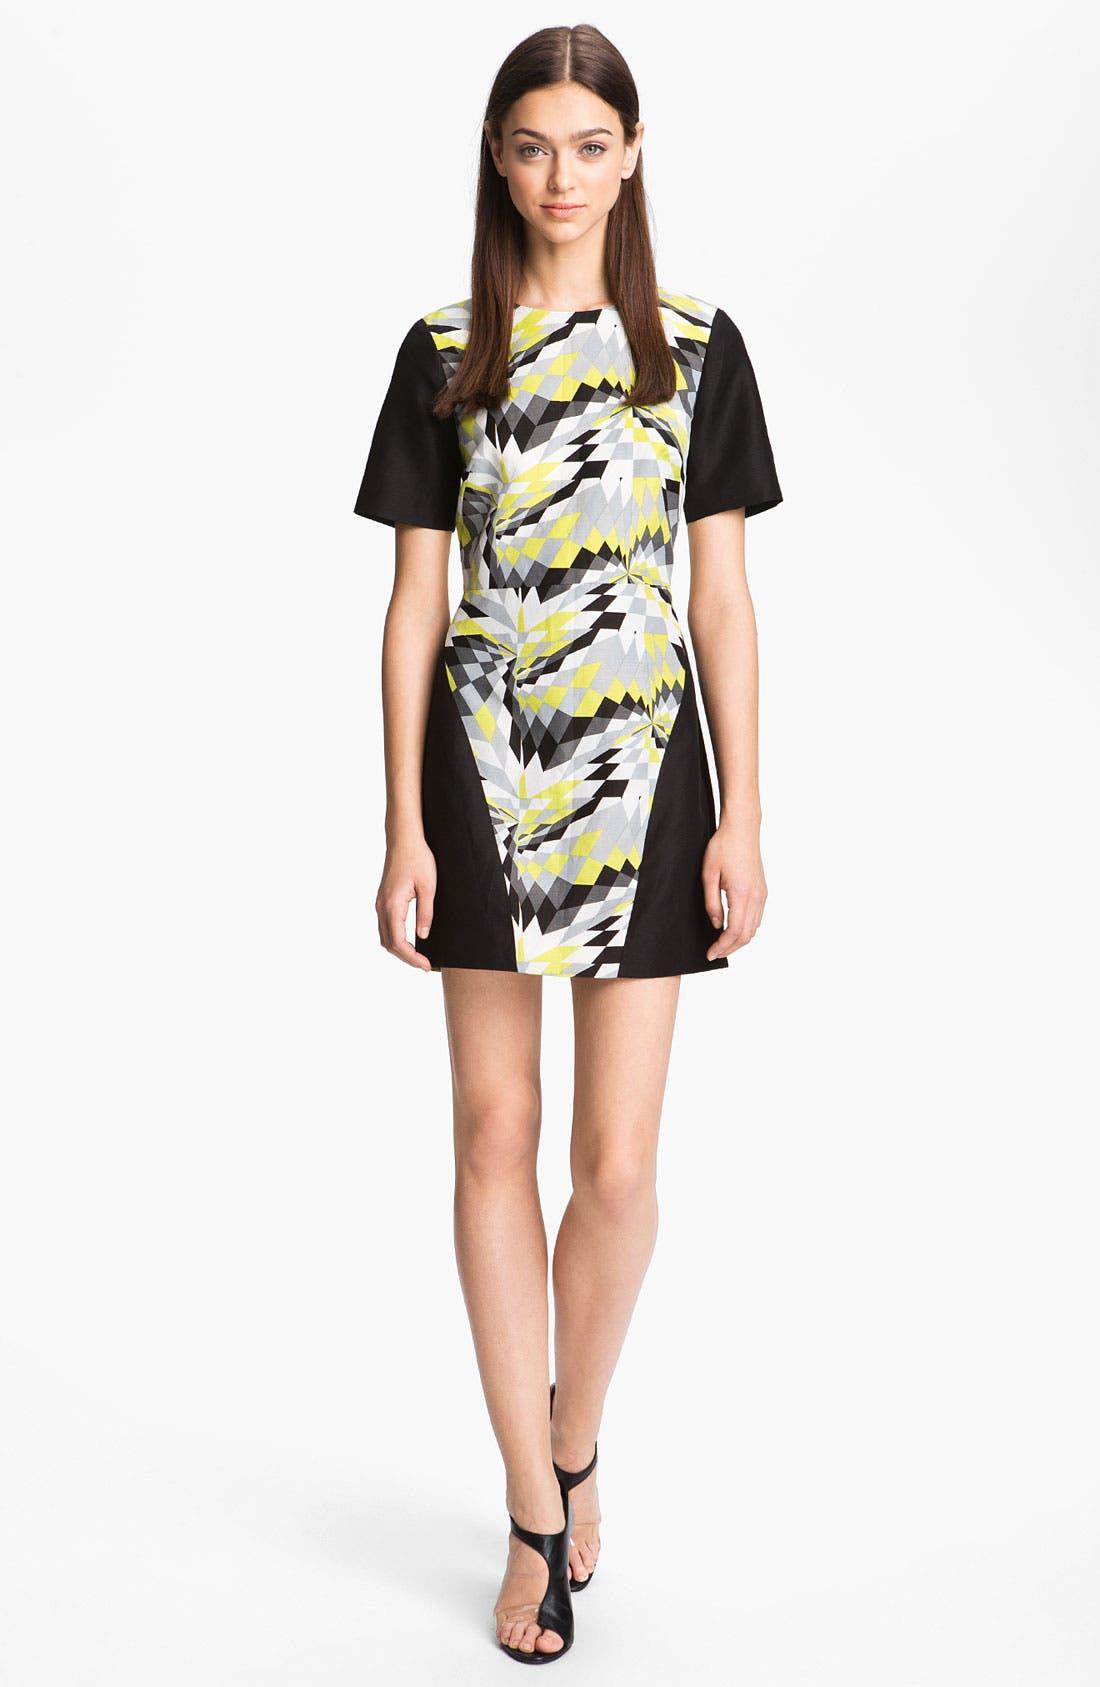 Alternate Image 1 Selected - Tibi 'Isosceles' Print Colorblock Dress